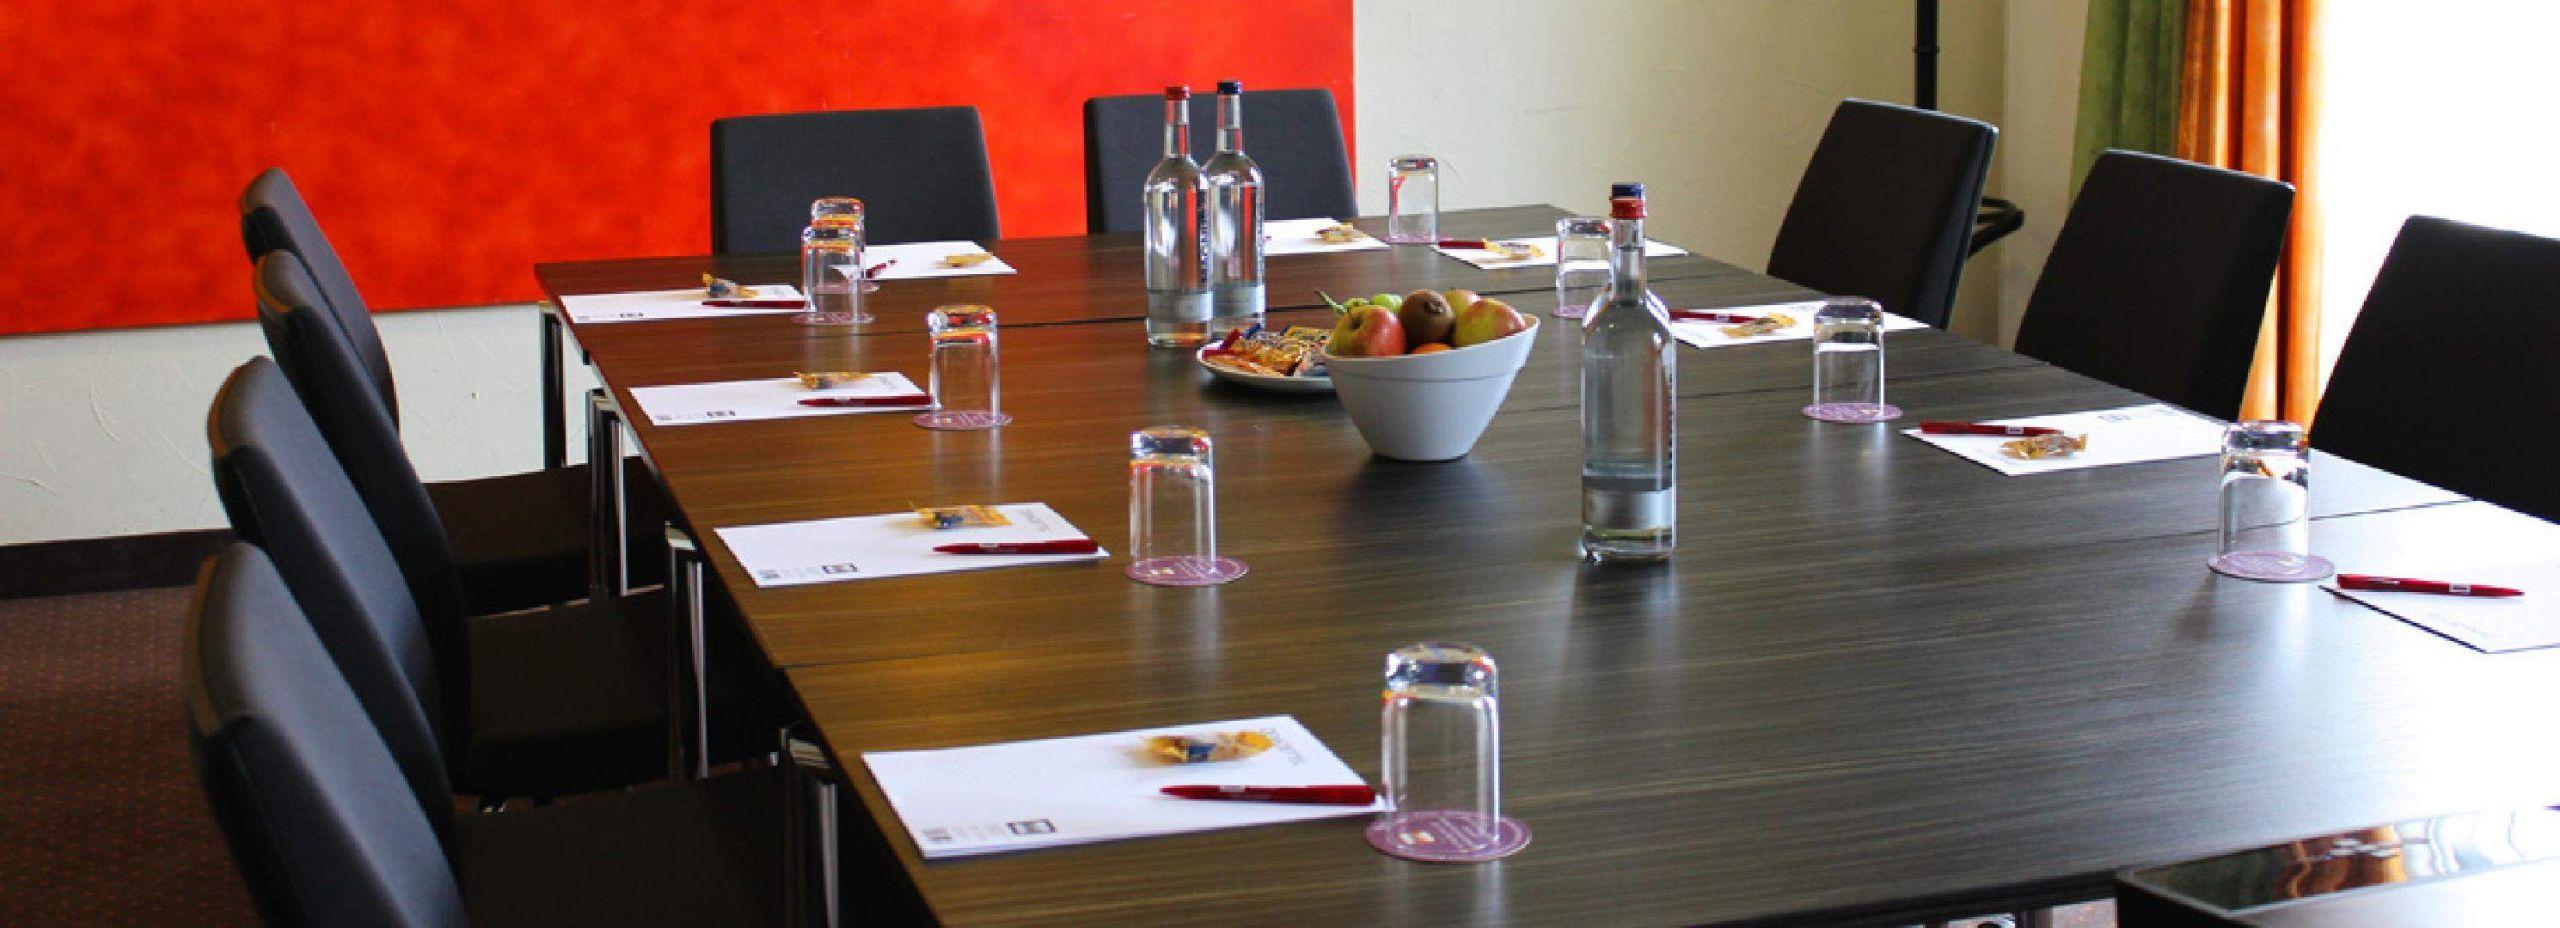 Pizza Garten Hannover Inspirierend Hotel Viva Creativo Hotel In Hannover – Restaurant